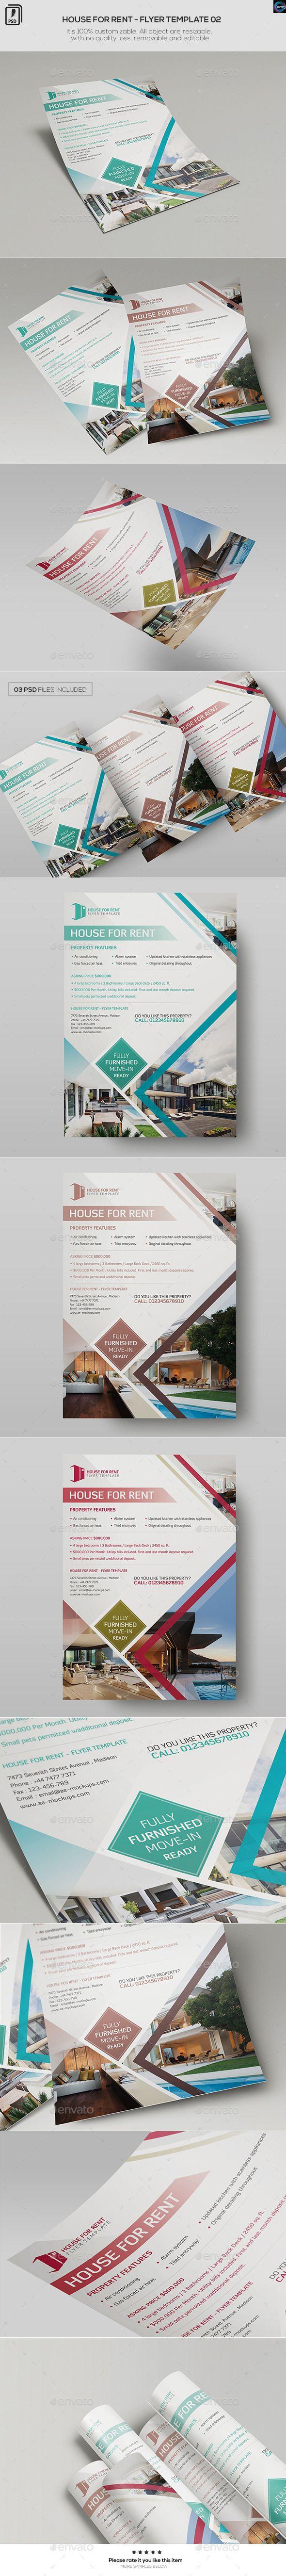 house for rent flyer template 02 templates pinterest flyer